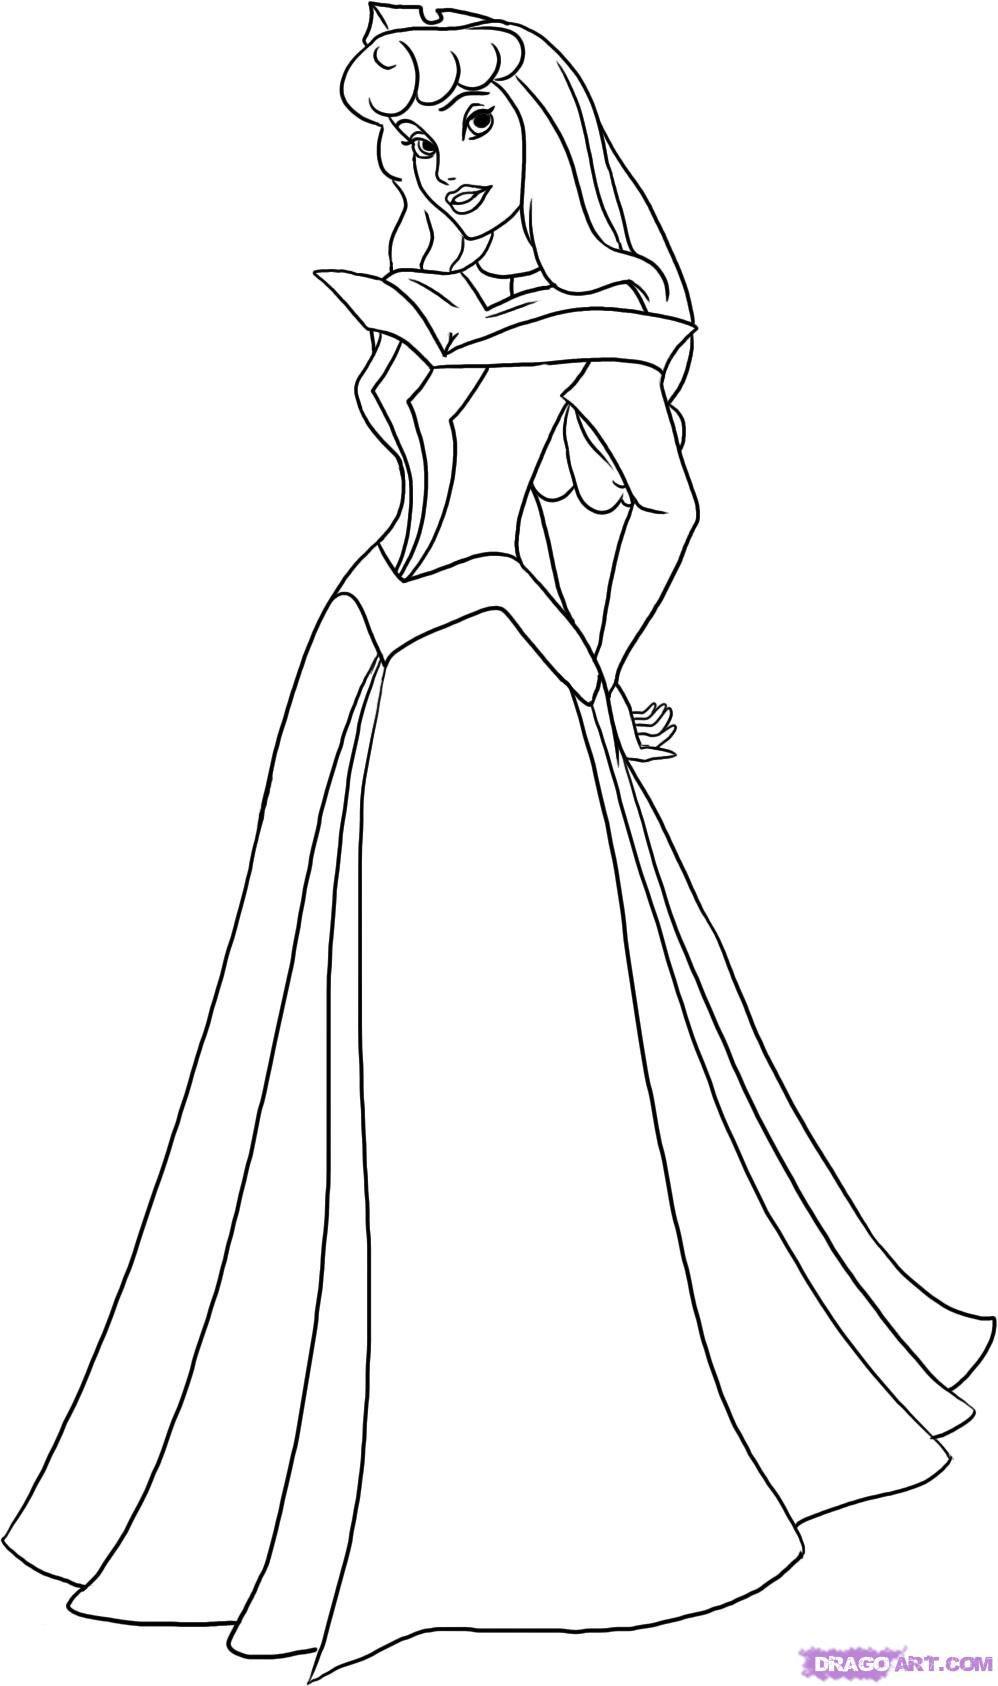 Princess Aurora Coloring Page Inspirations Pinterest